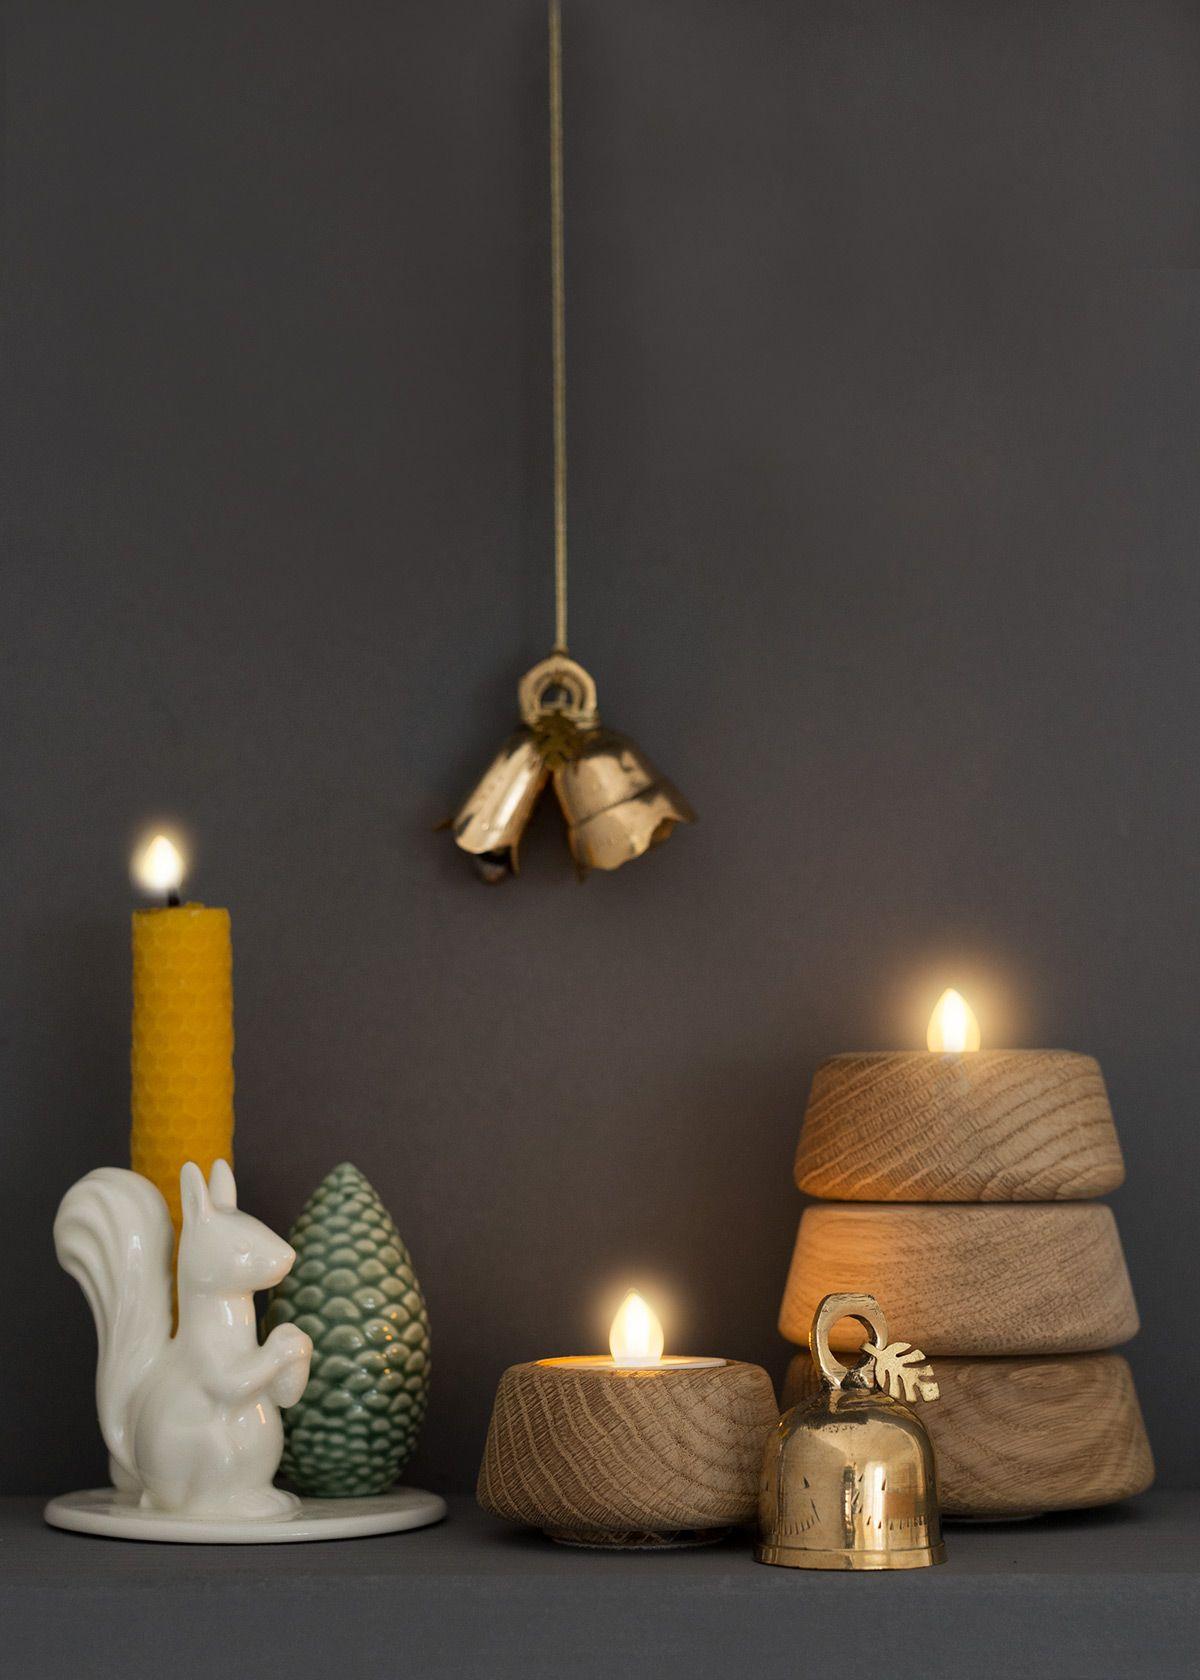 Dottir Winterstories Squirrel Applicata Spruce Wunderschoen Gemacht Kerzen Kerzenhalter Weihnachtsdeko Ideen Diy